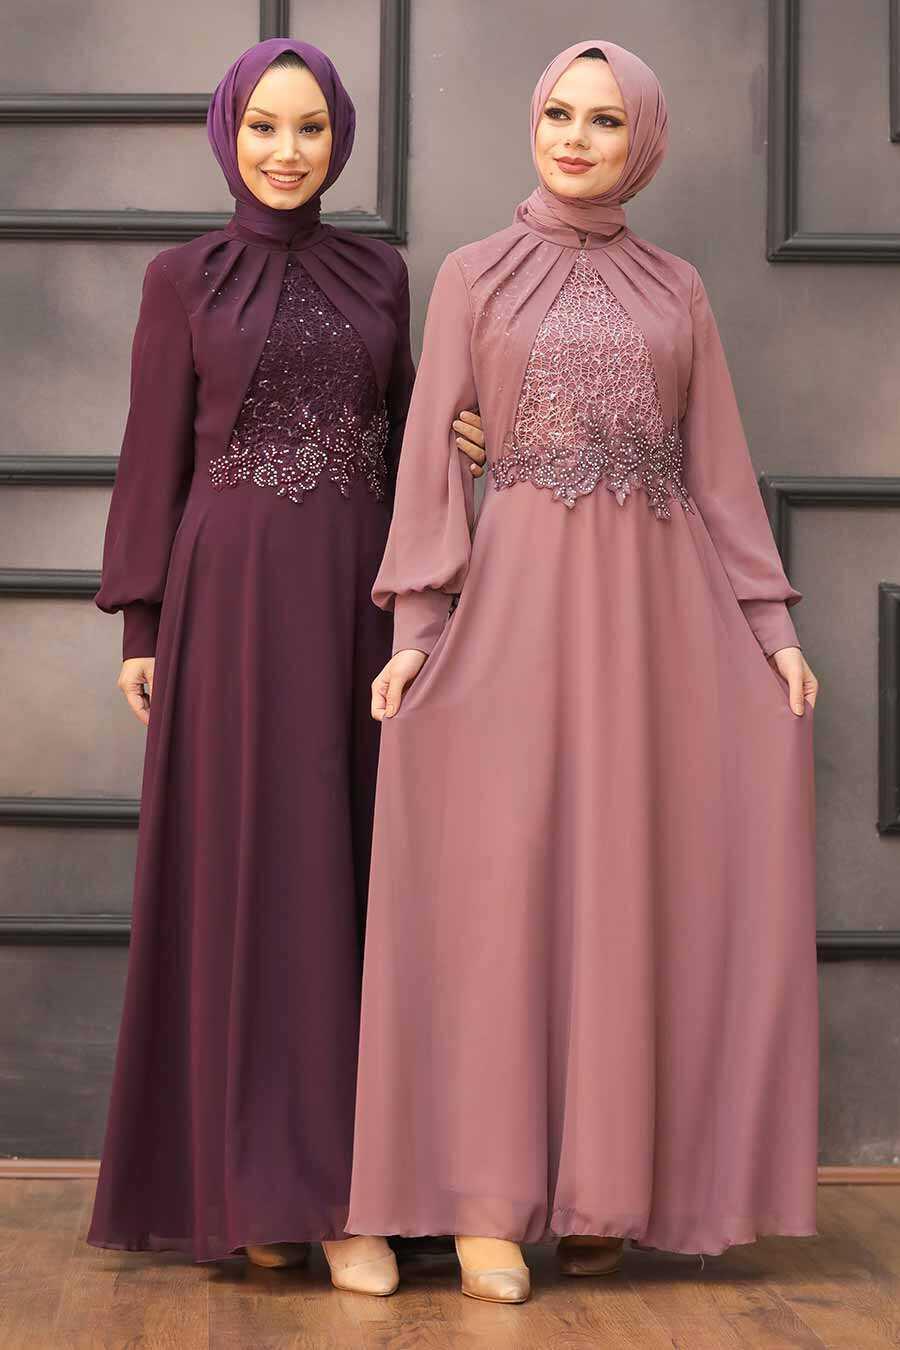 Dusty Rose Hijab Evening Dress 52785GK